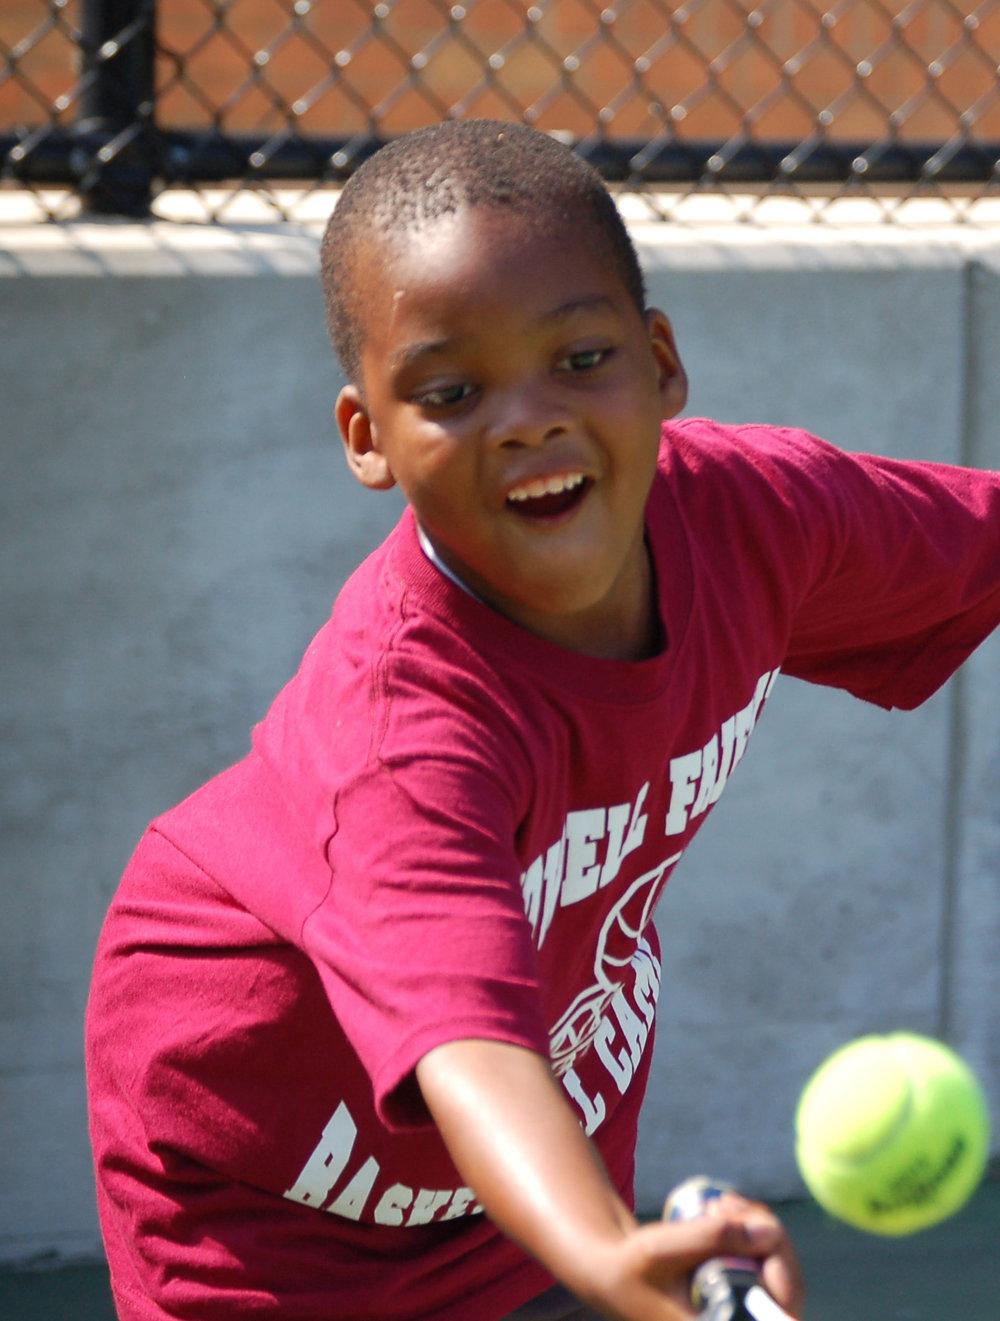 tennis in action.JPG